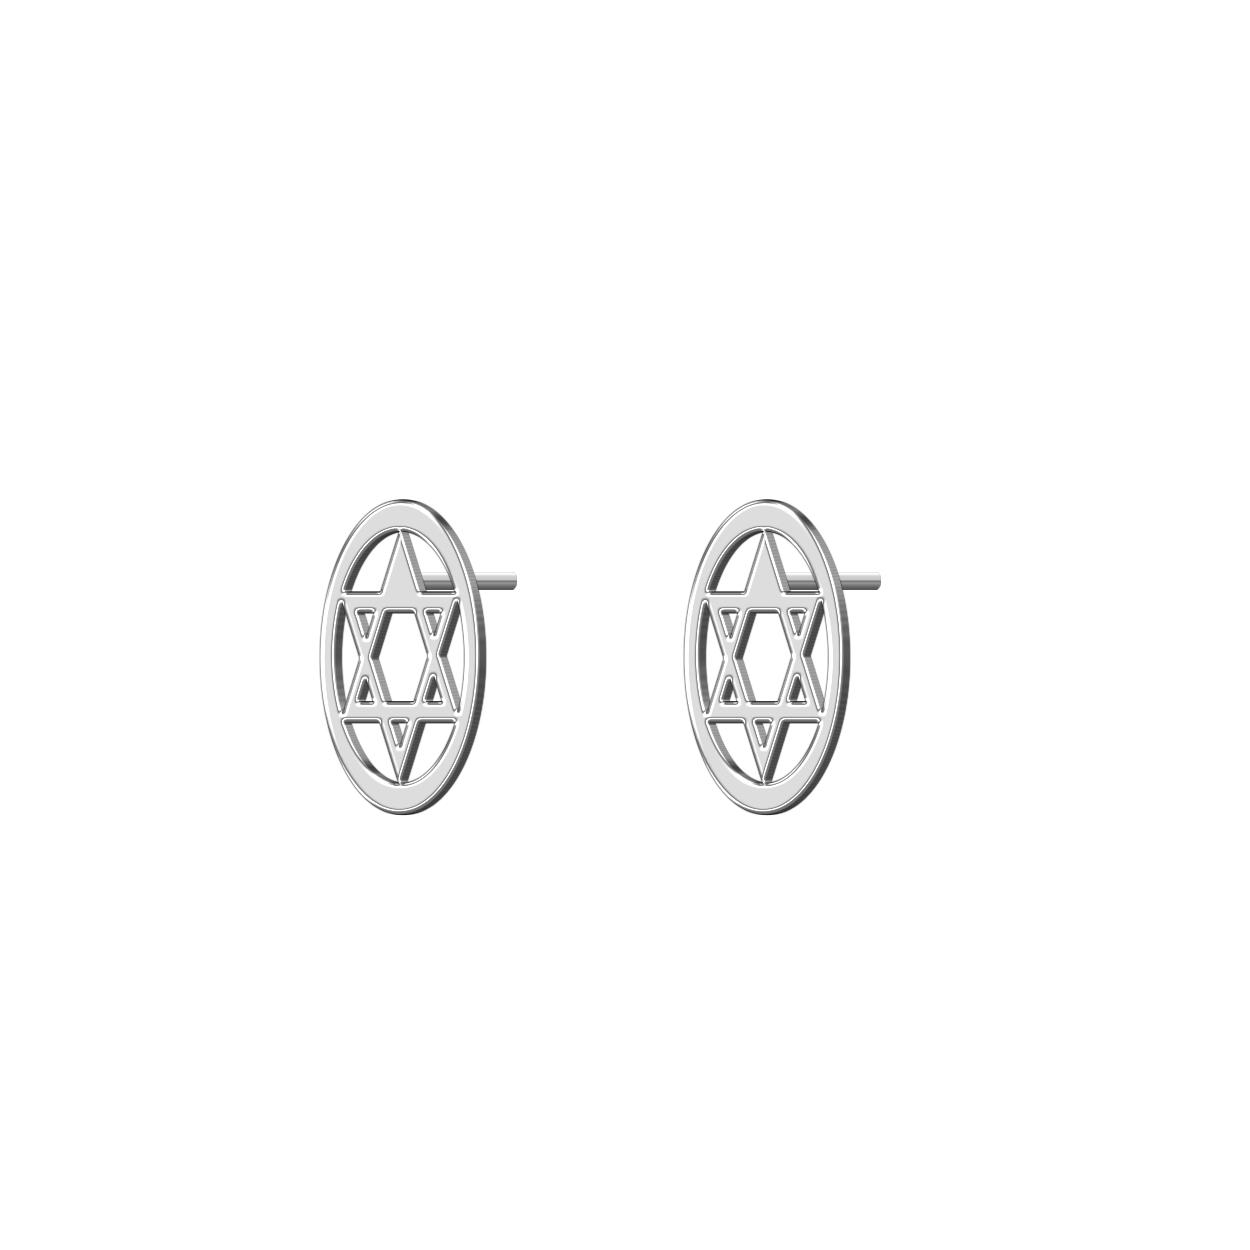 گوشواره نقره زنانه ترمه 1 طرح استار کد E527